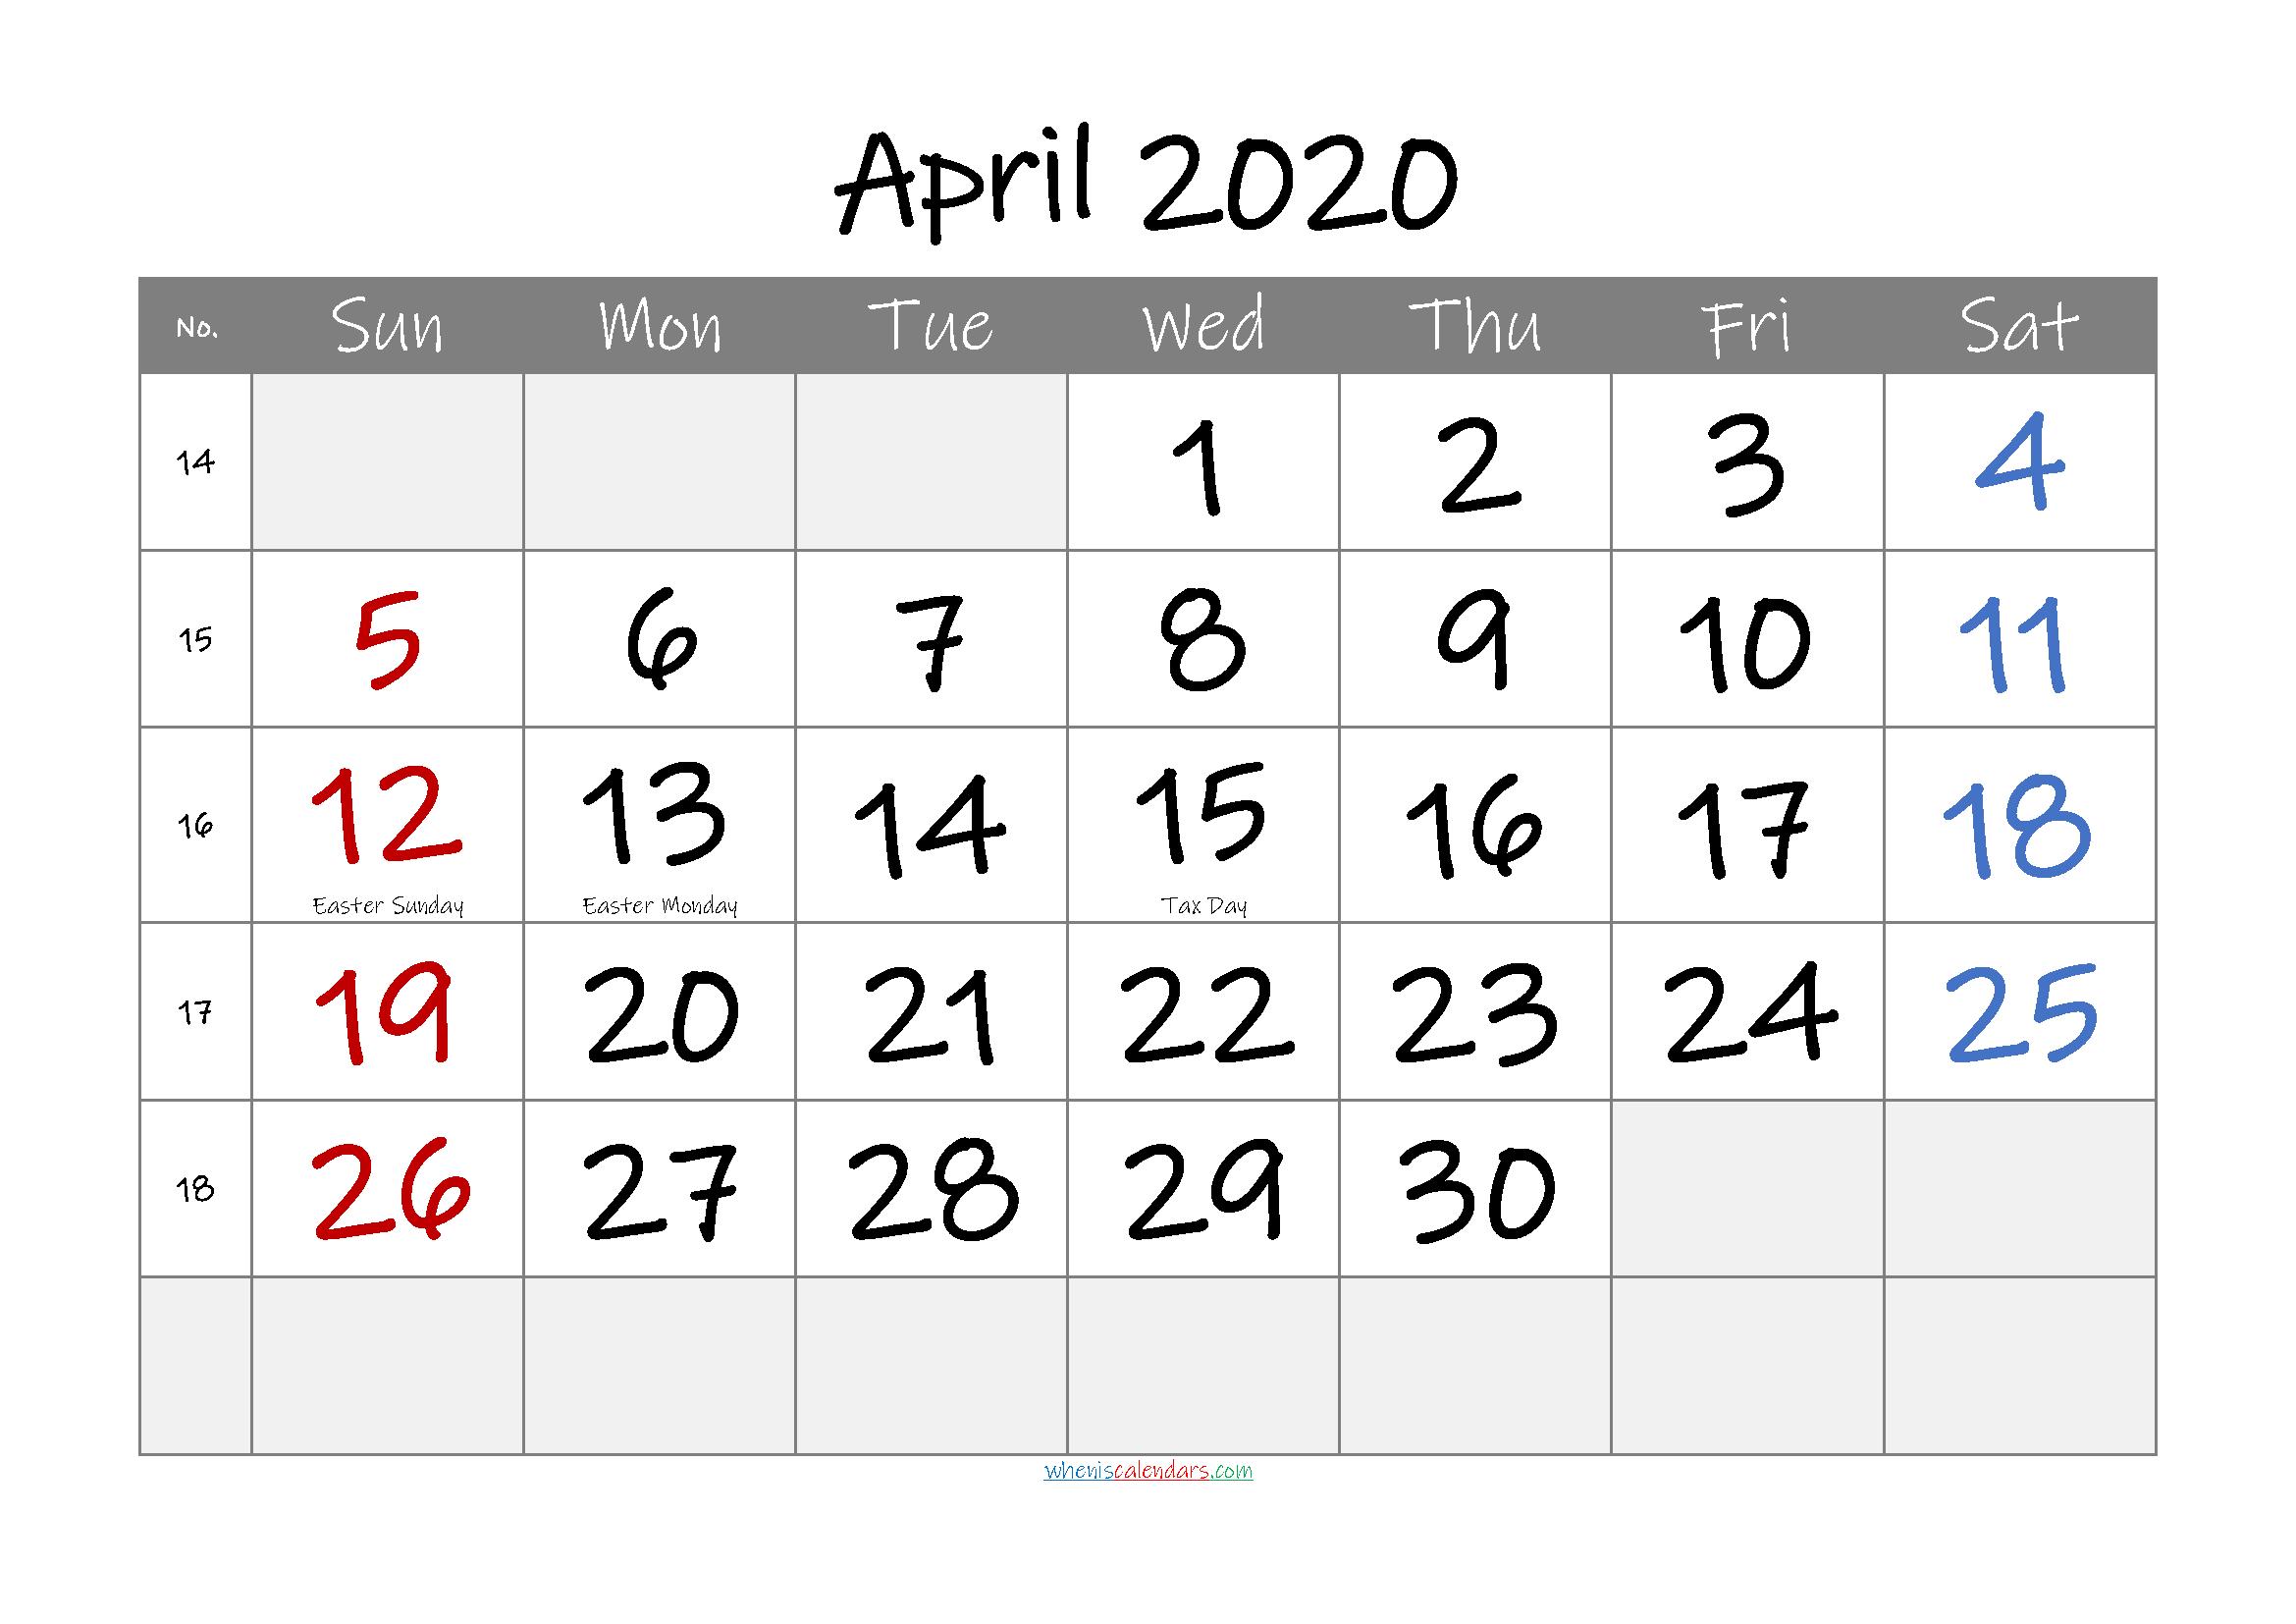 April 2020 Free Printable Calendar